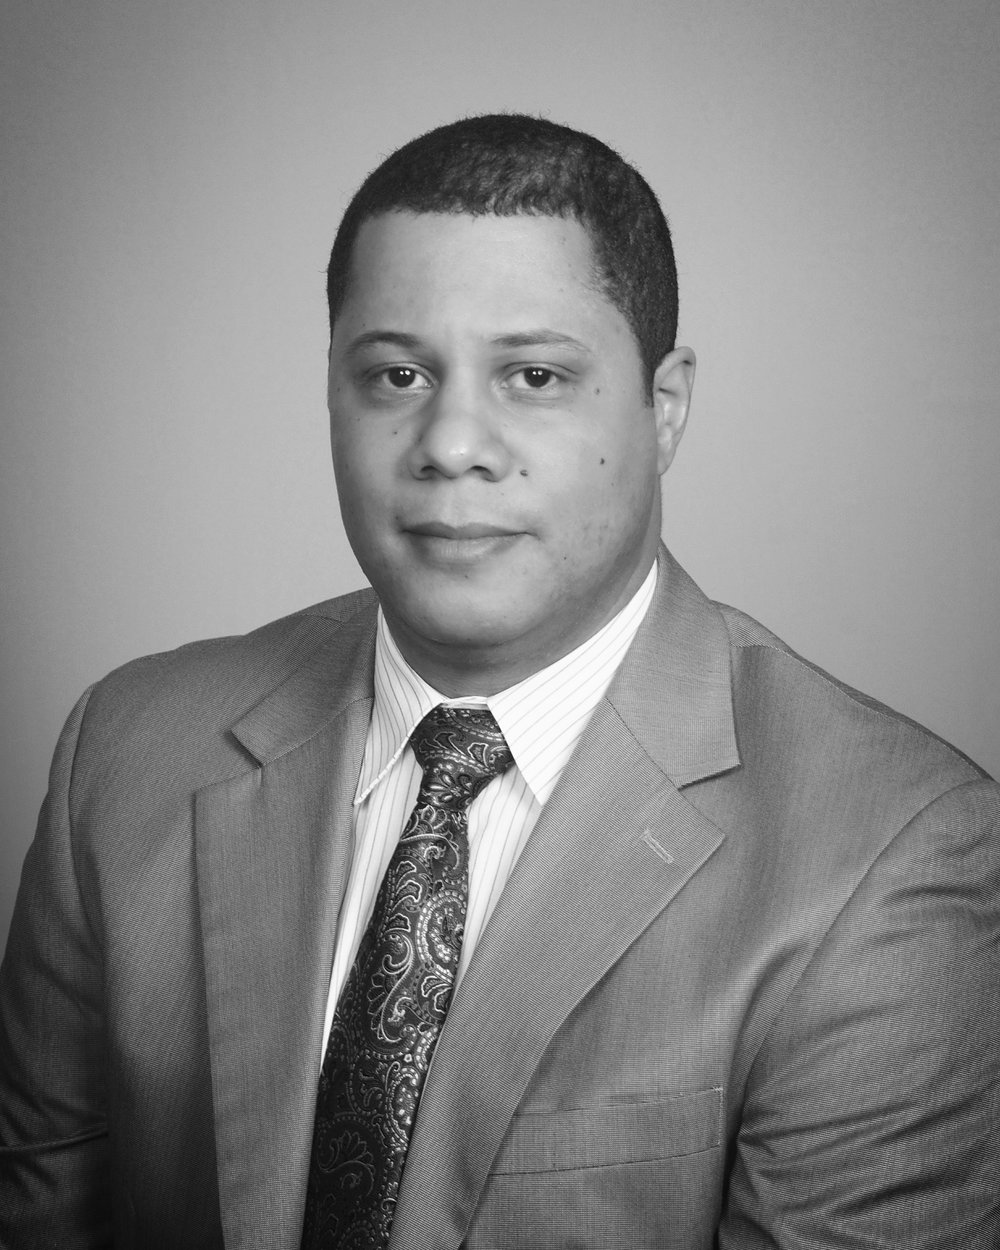 Academy M Board Member Jay Patrick Kennedy, Ph.D